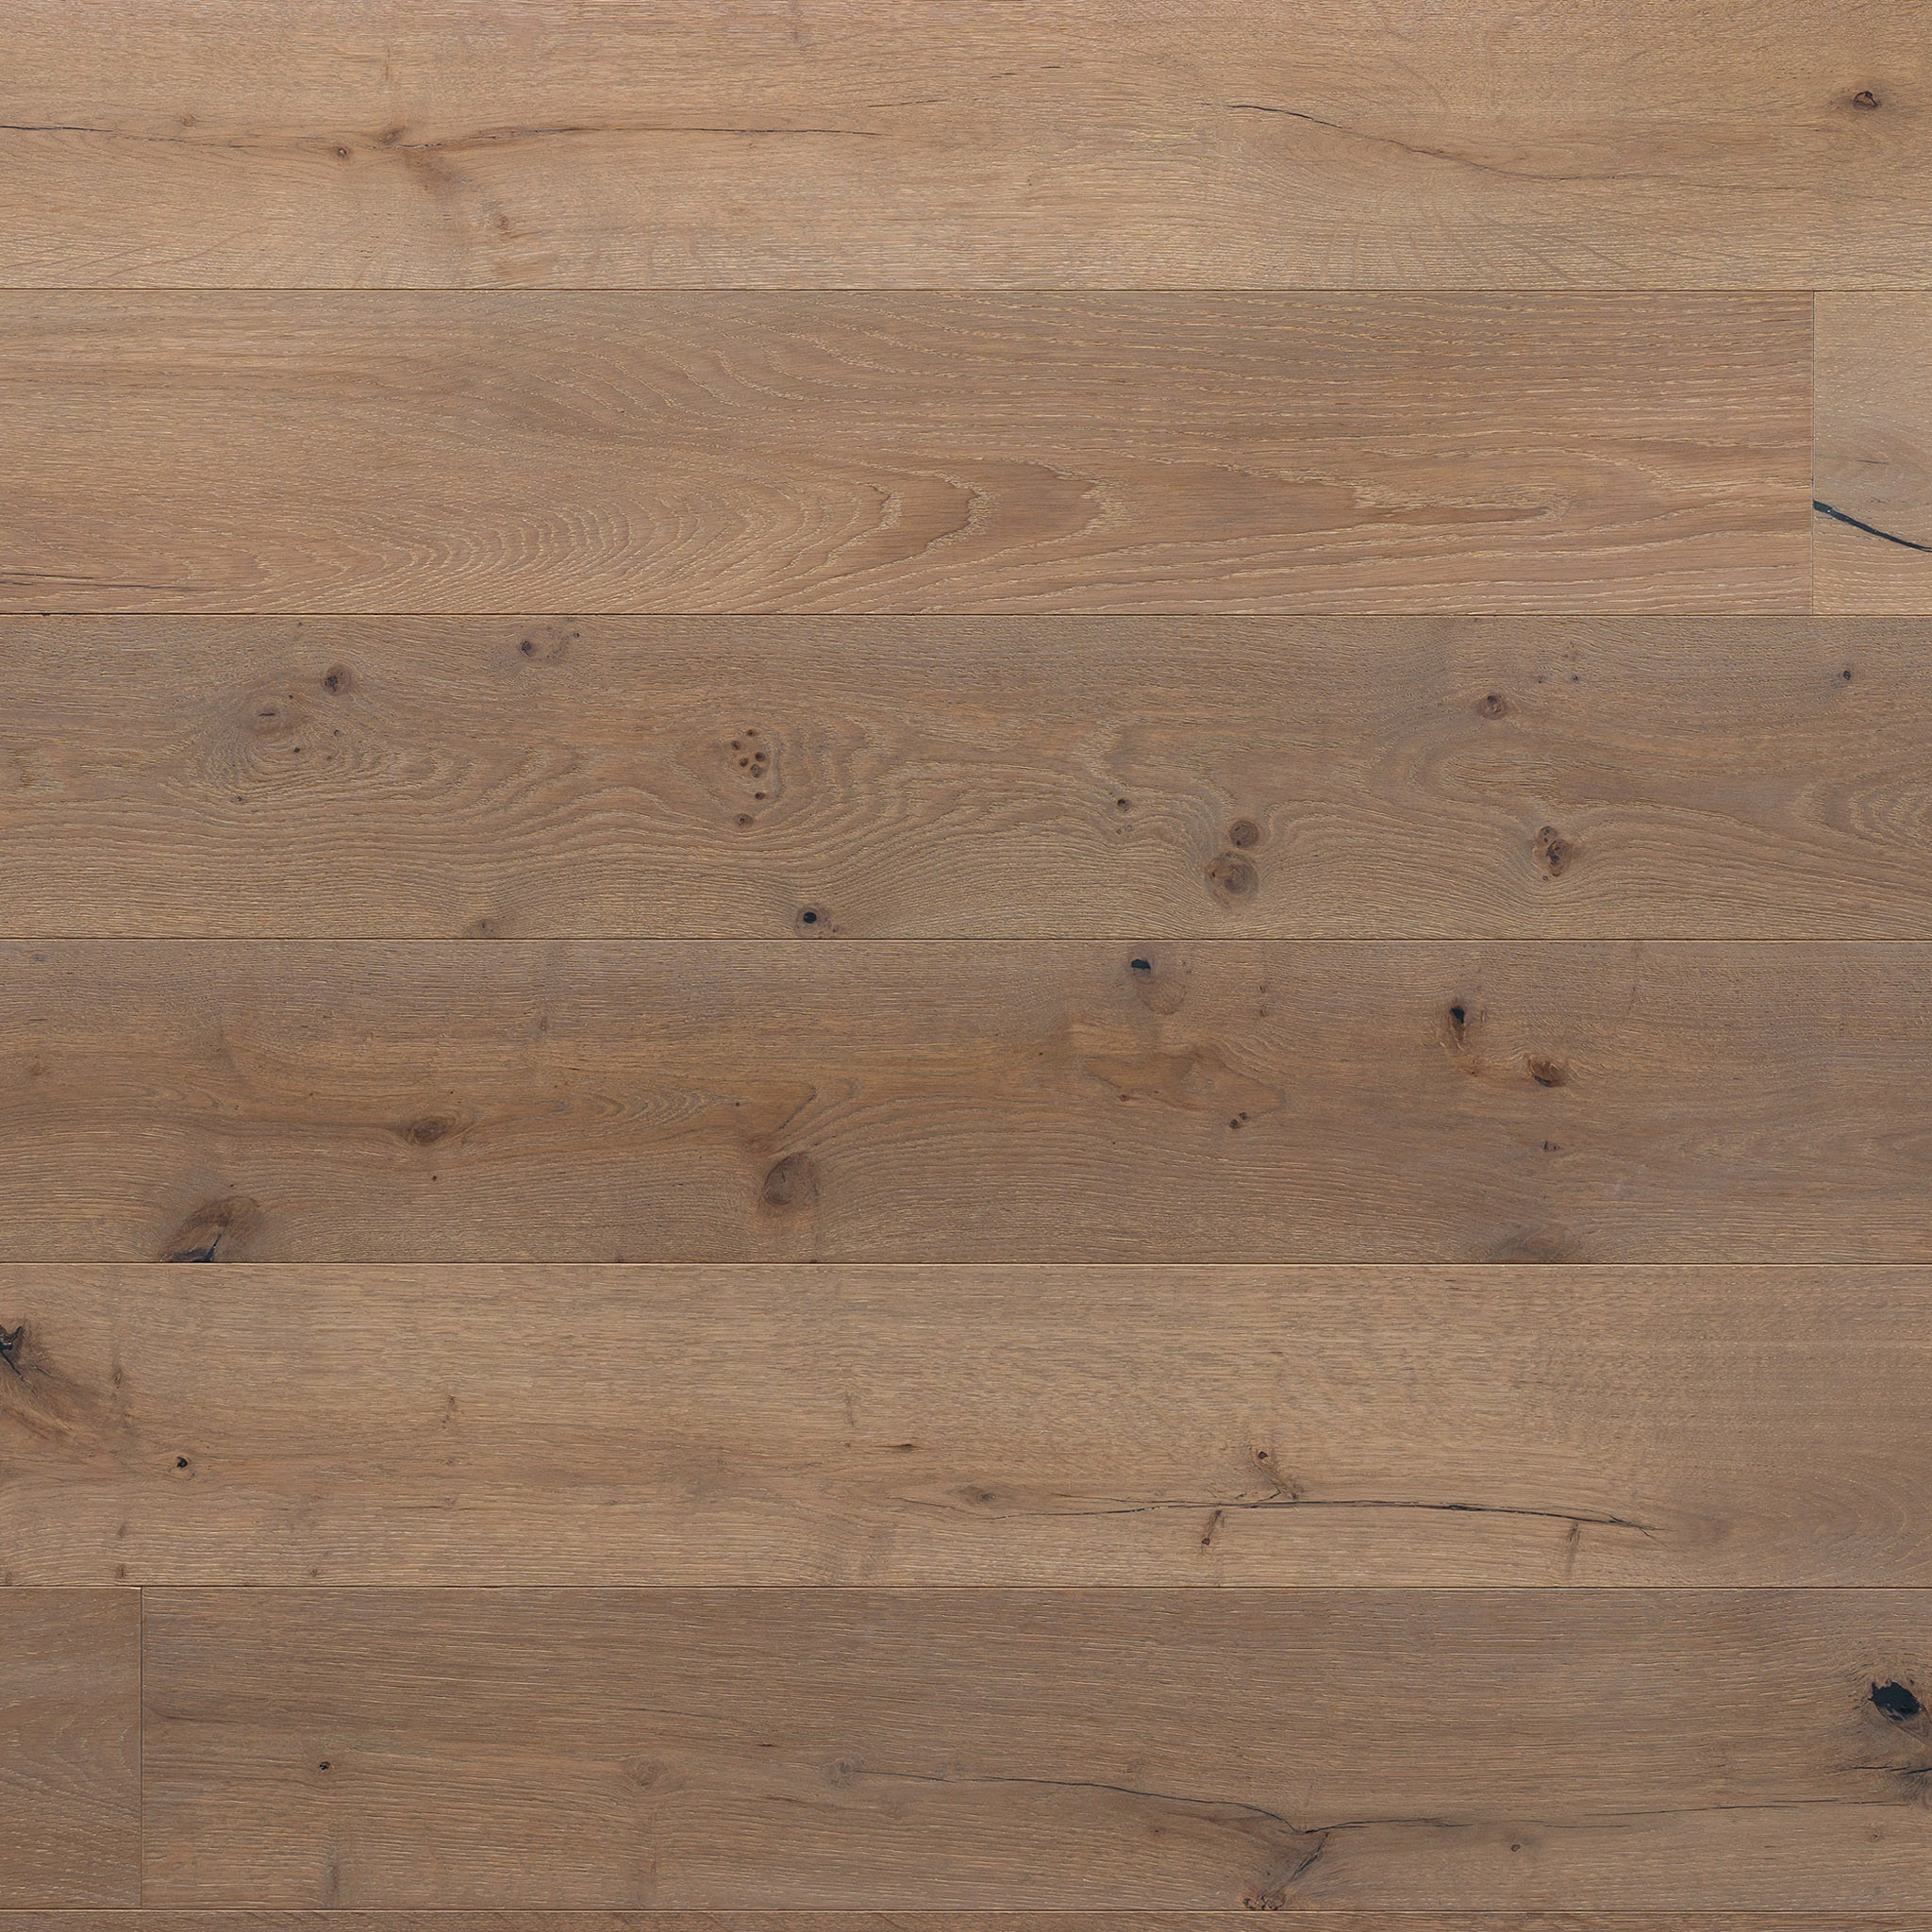 cheap hardwood flooring canada of brushed oak burrow kentwood floors in brushed oak burrow